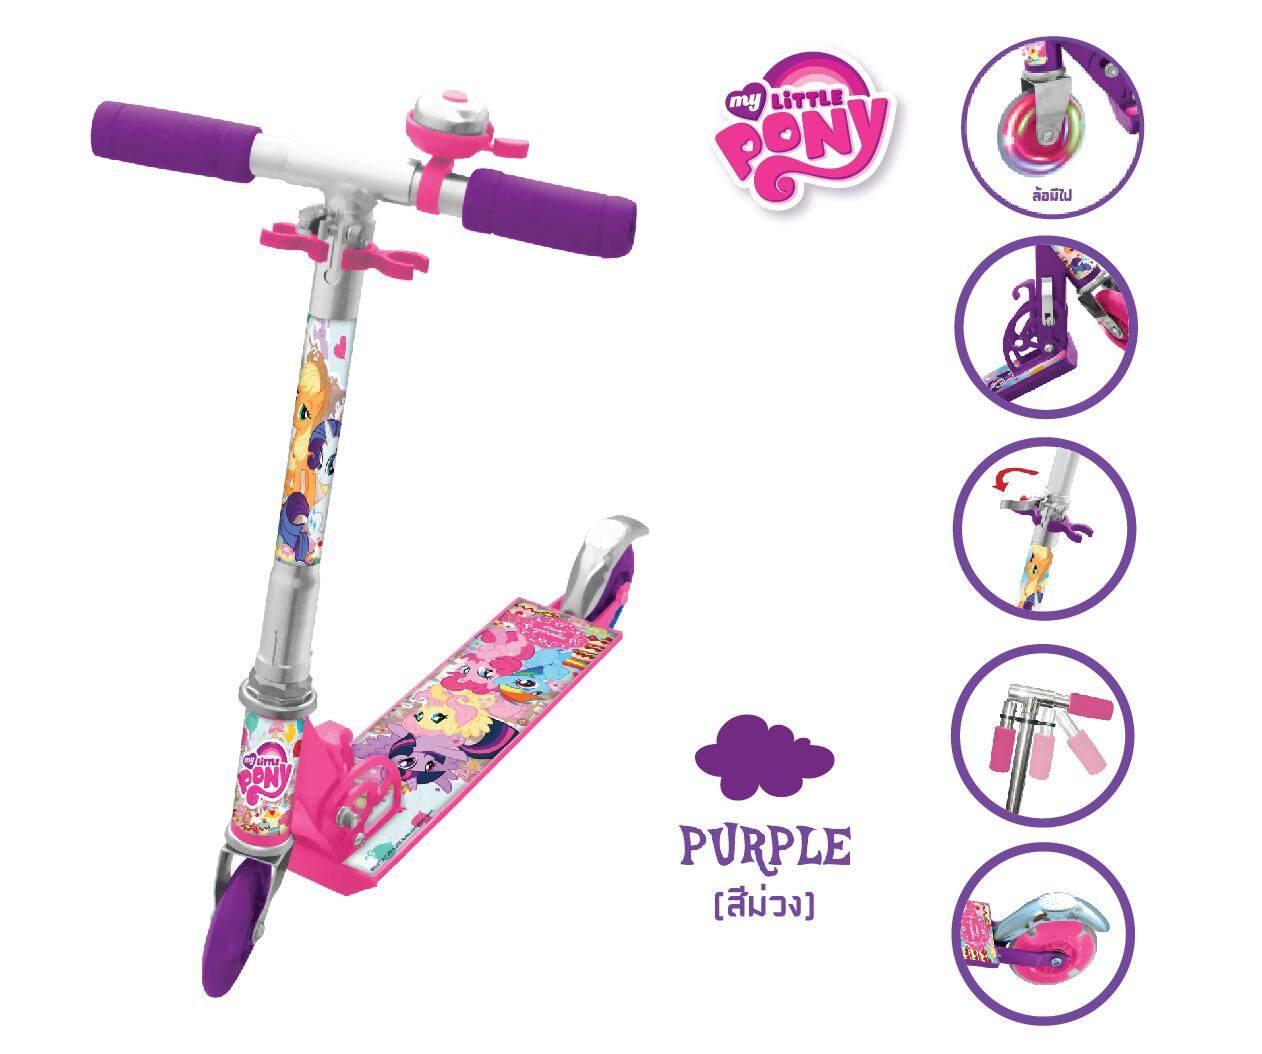 My Little Pony สกู๊ตเตอร์ สำหรับเด็ก มี 2 ล้อ By Toys Mart Shop.